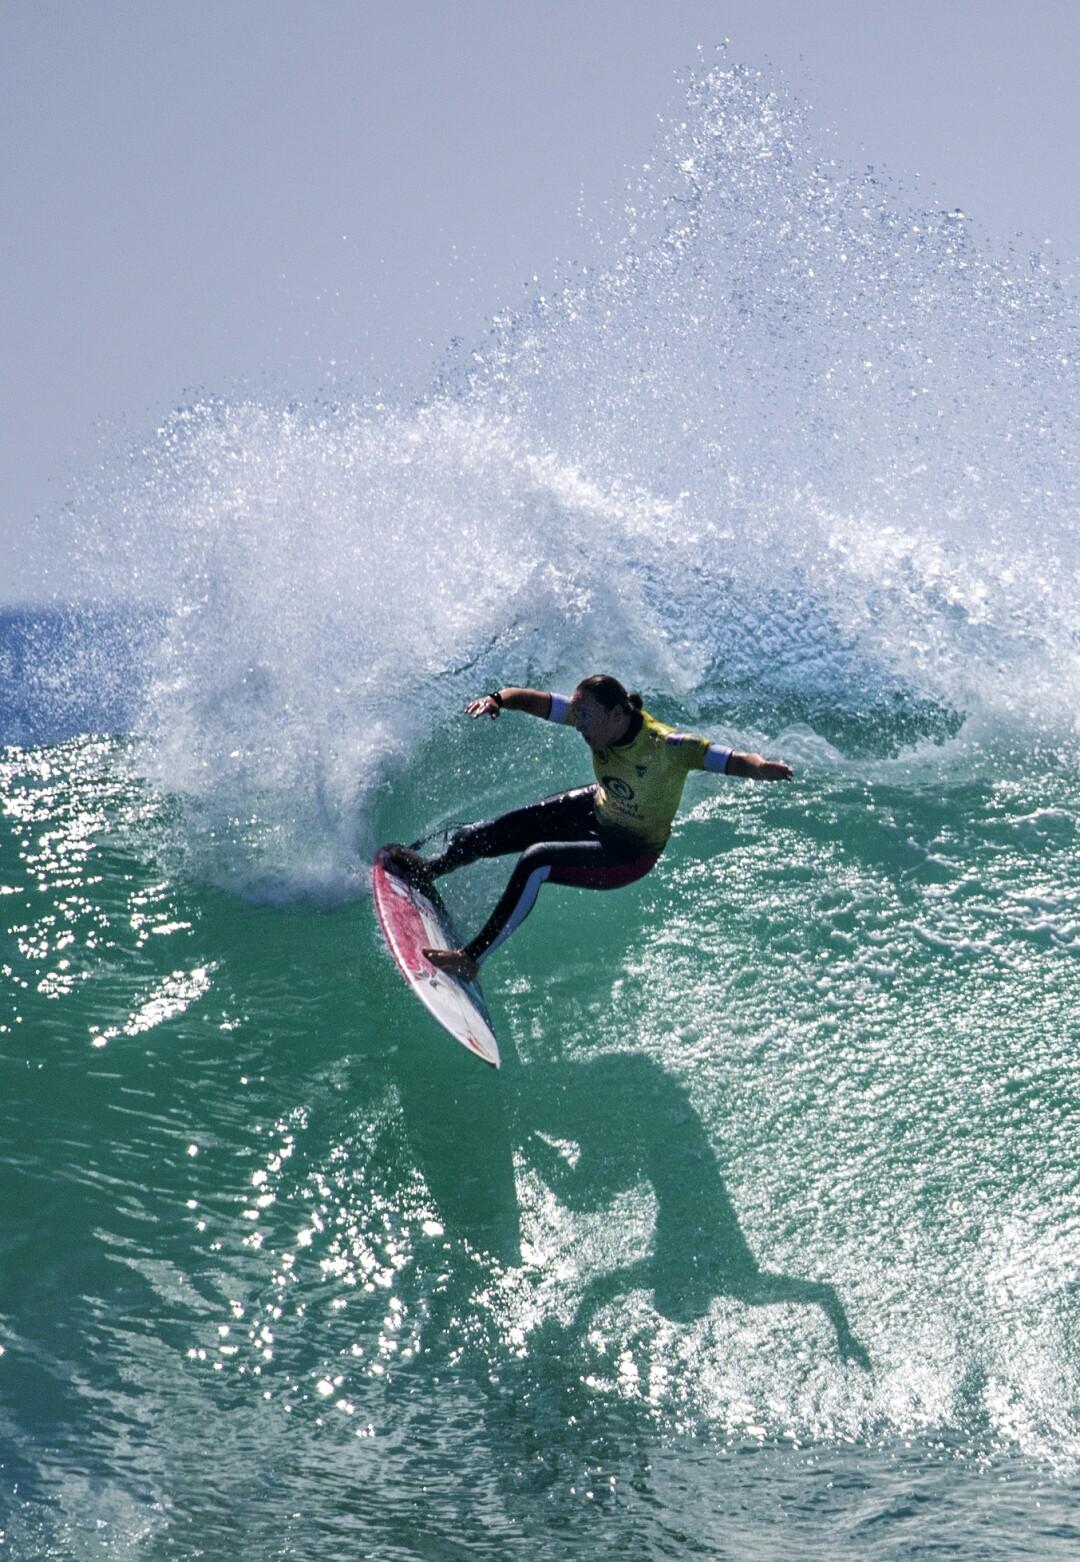 Carissa Moore turns off the top of a big wave against Tatiana Weston-Webb